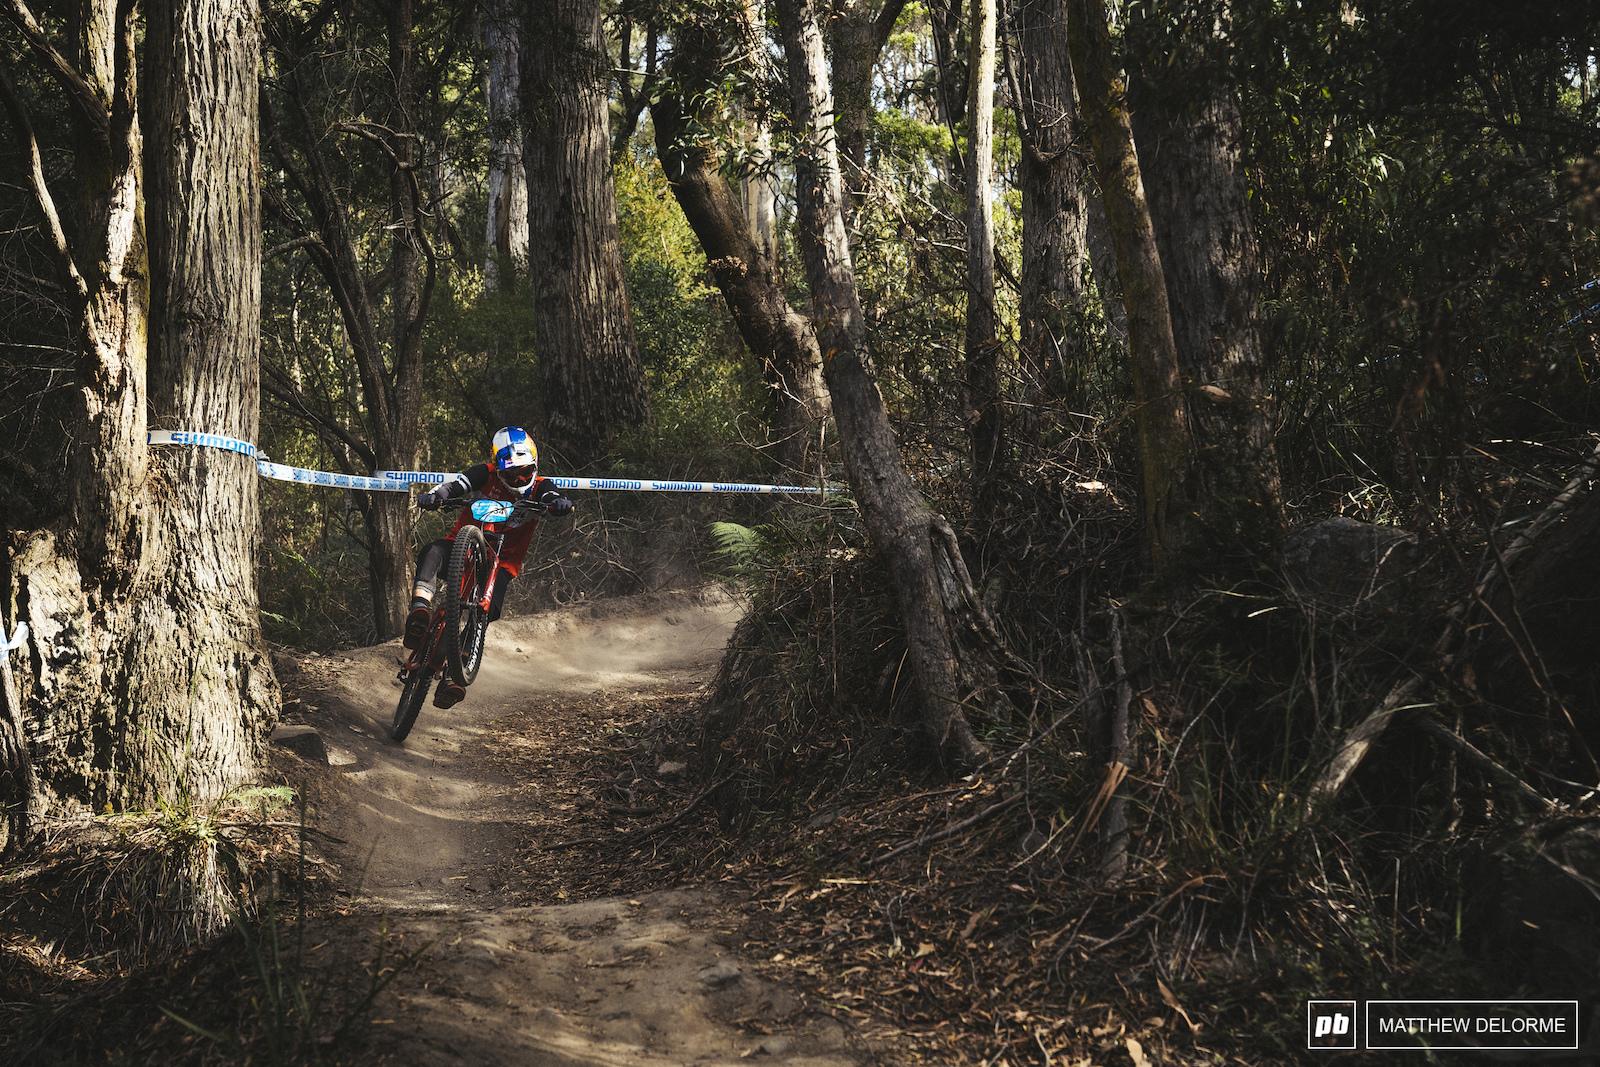 Pedro Burns is loving the tracks here in Tasmania.